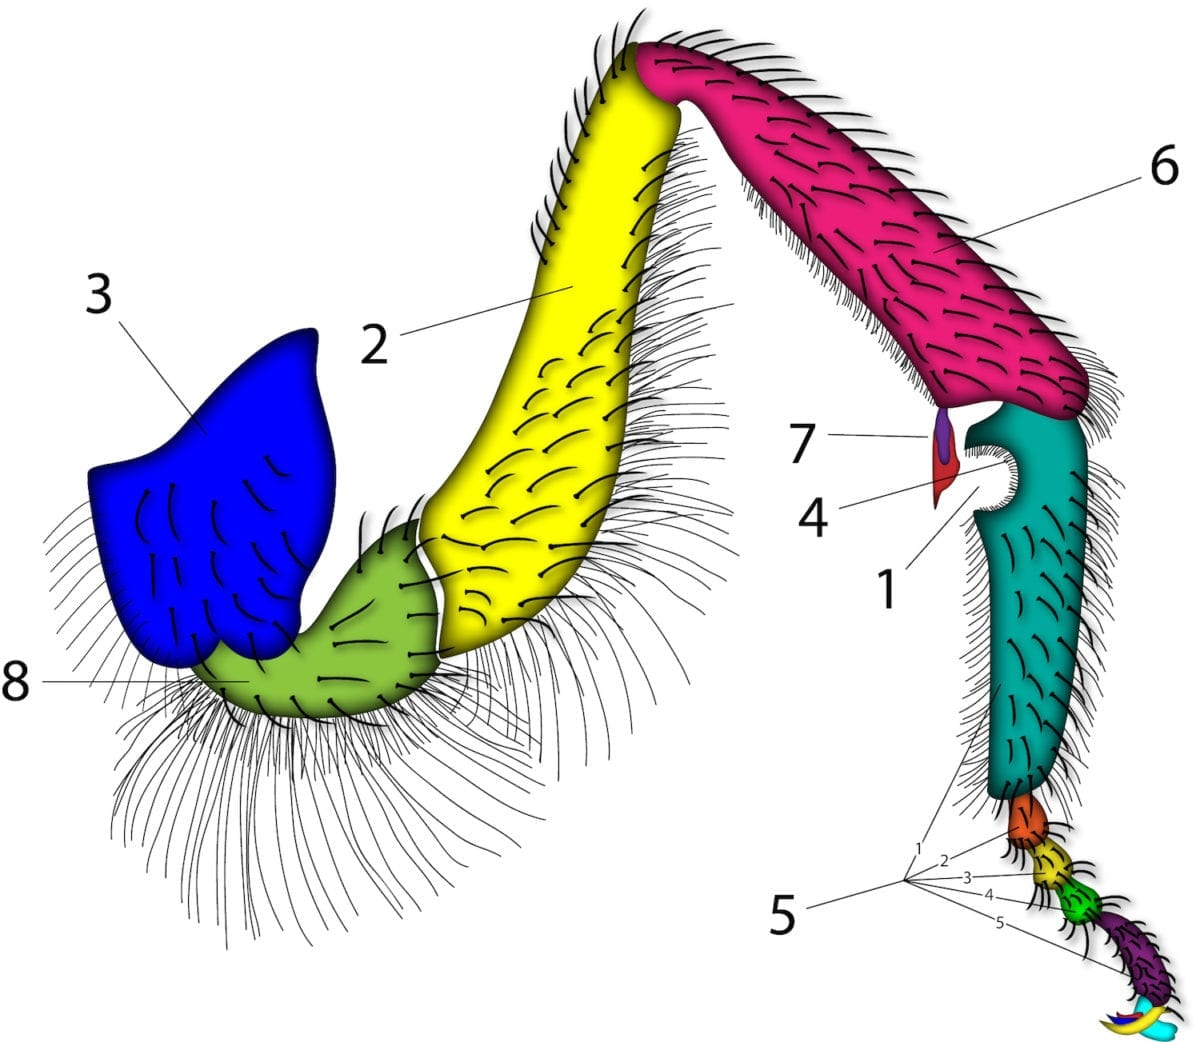 Anatomie - Imkerverein Stierberg